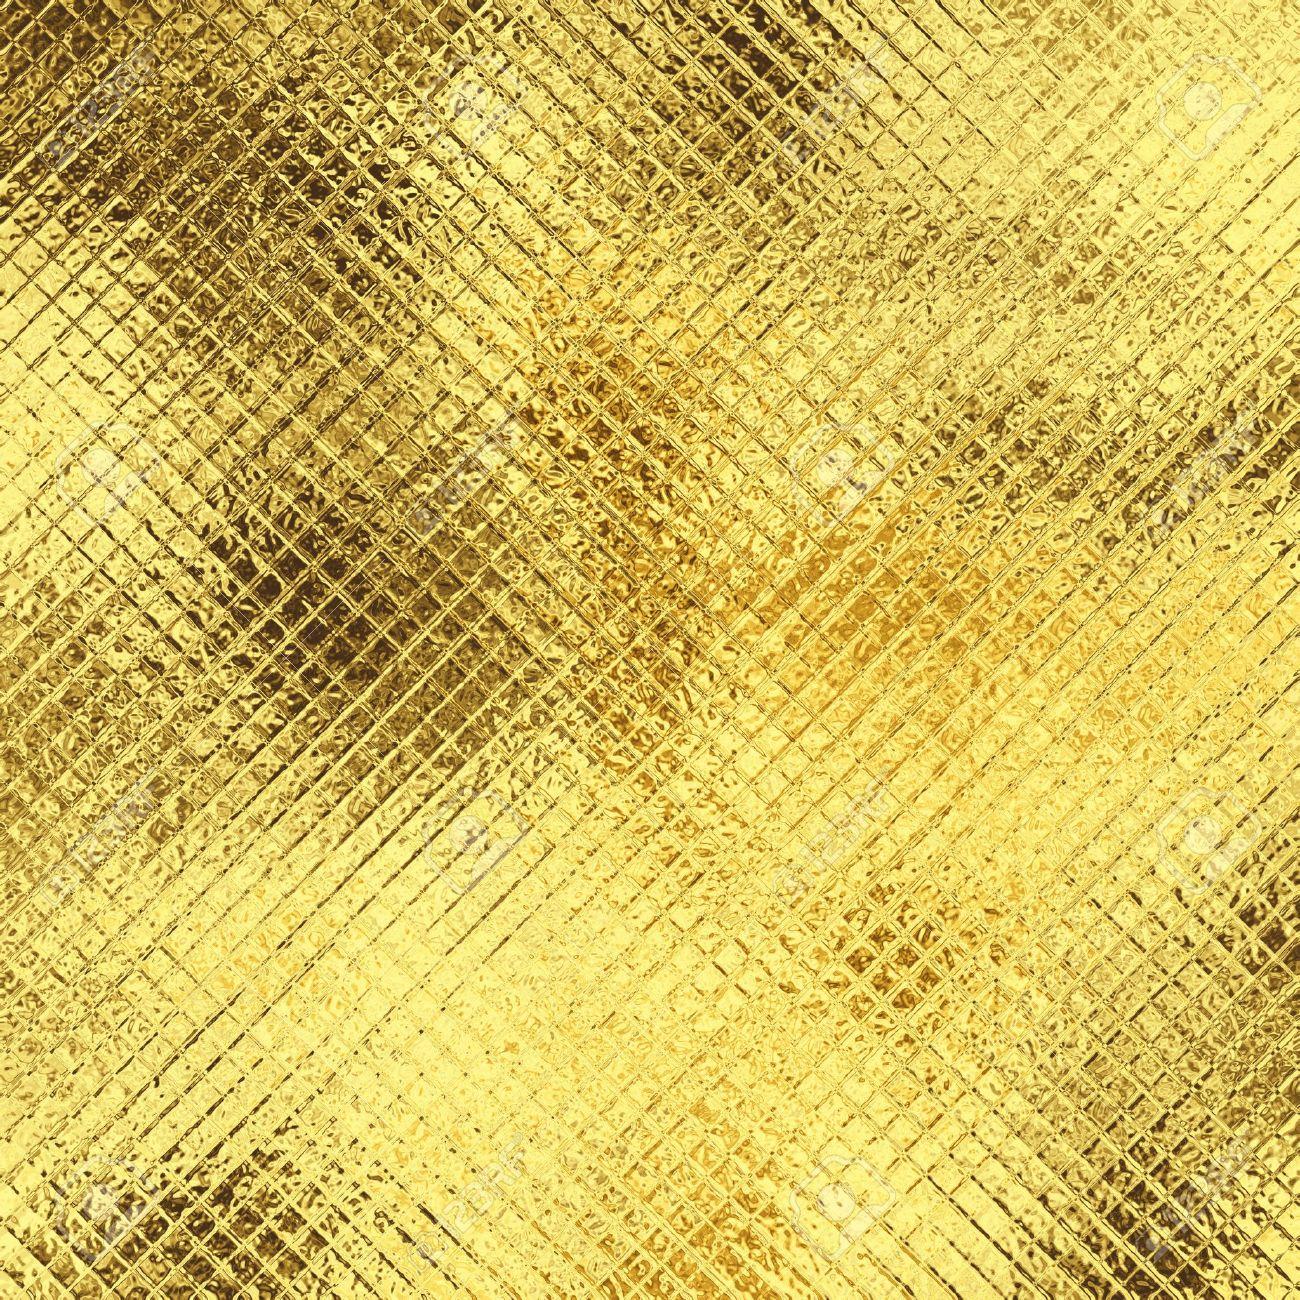 gold foil Stock Photo - 10183214